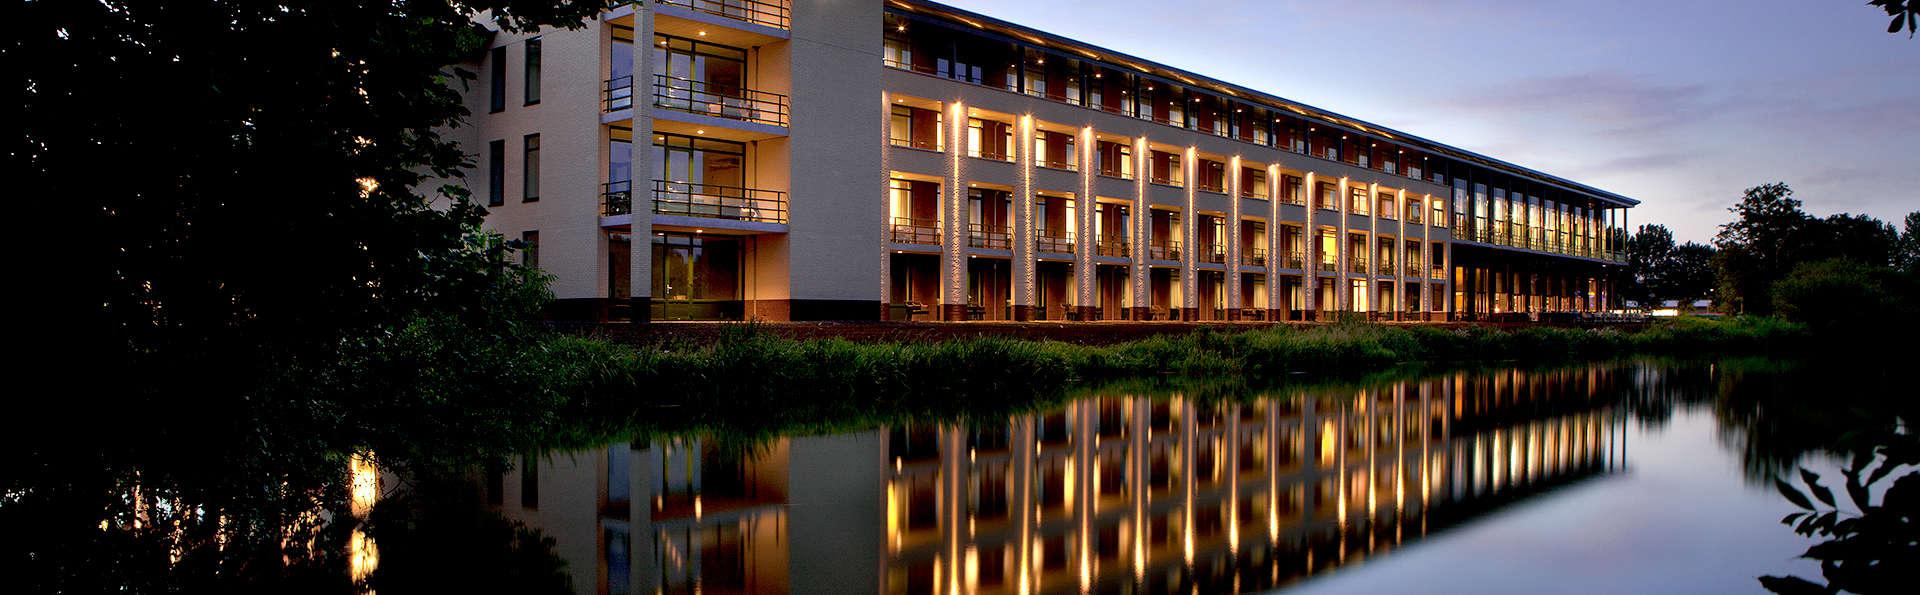 Van der Valk Hotel Sneek - Edit_Front.jpg